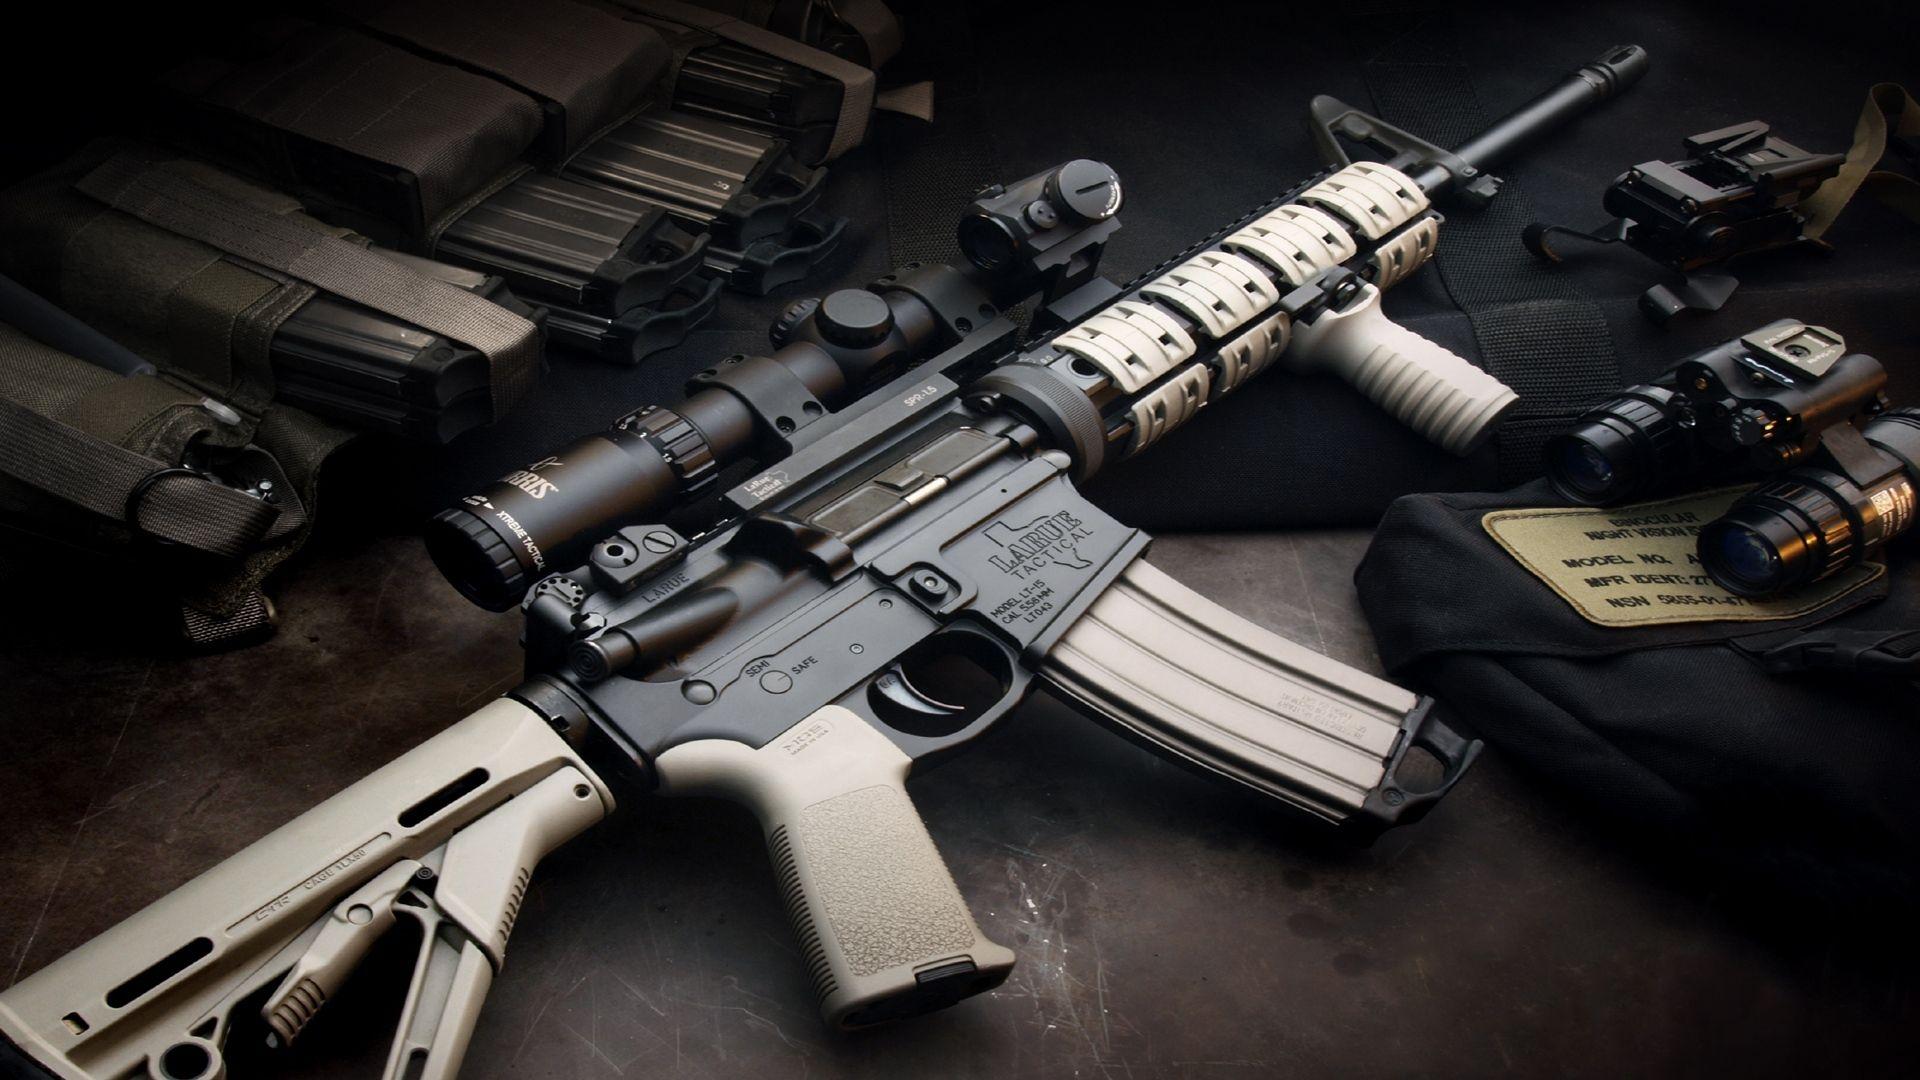 Pin On Shooting Gear